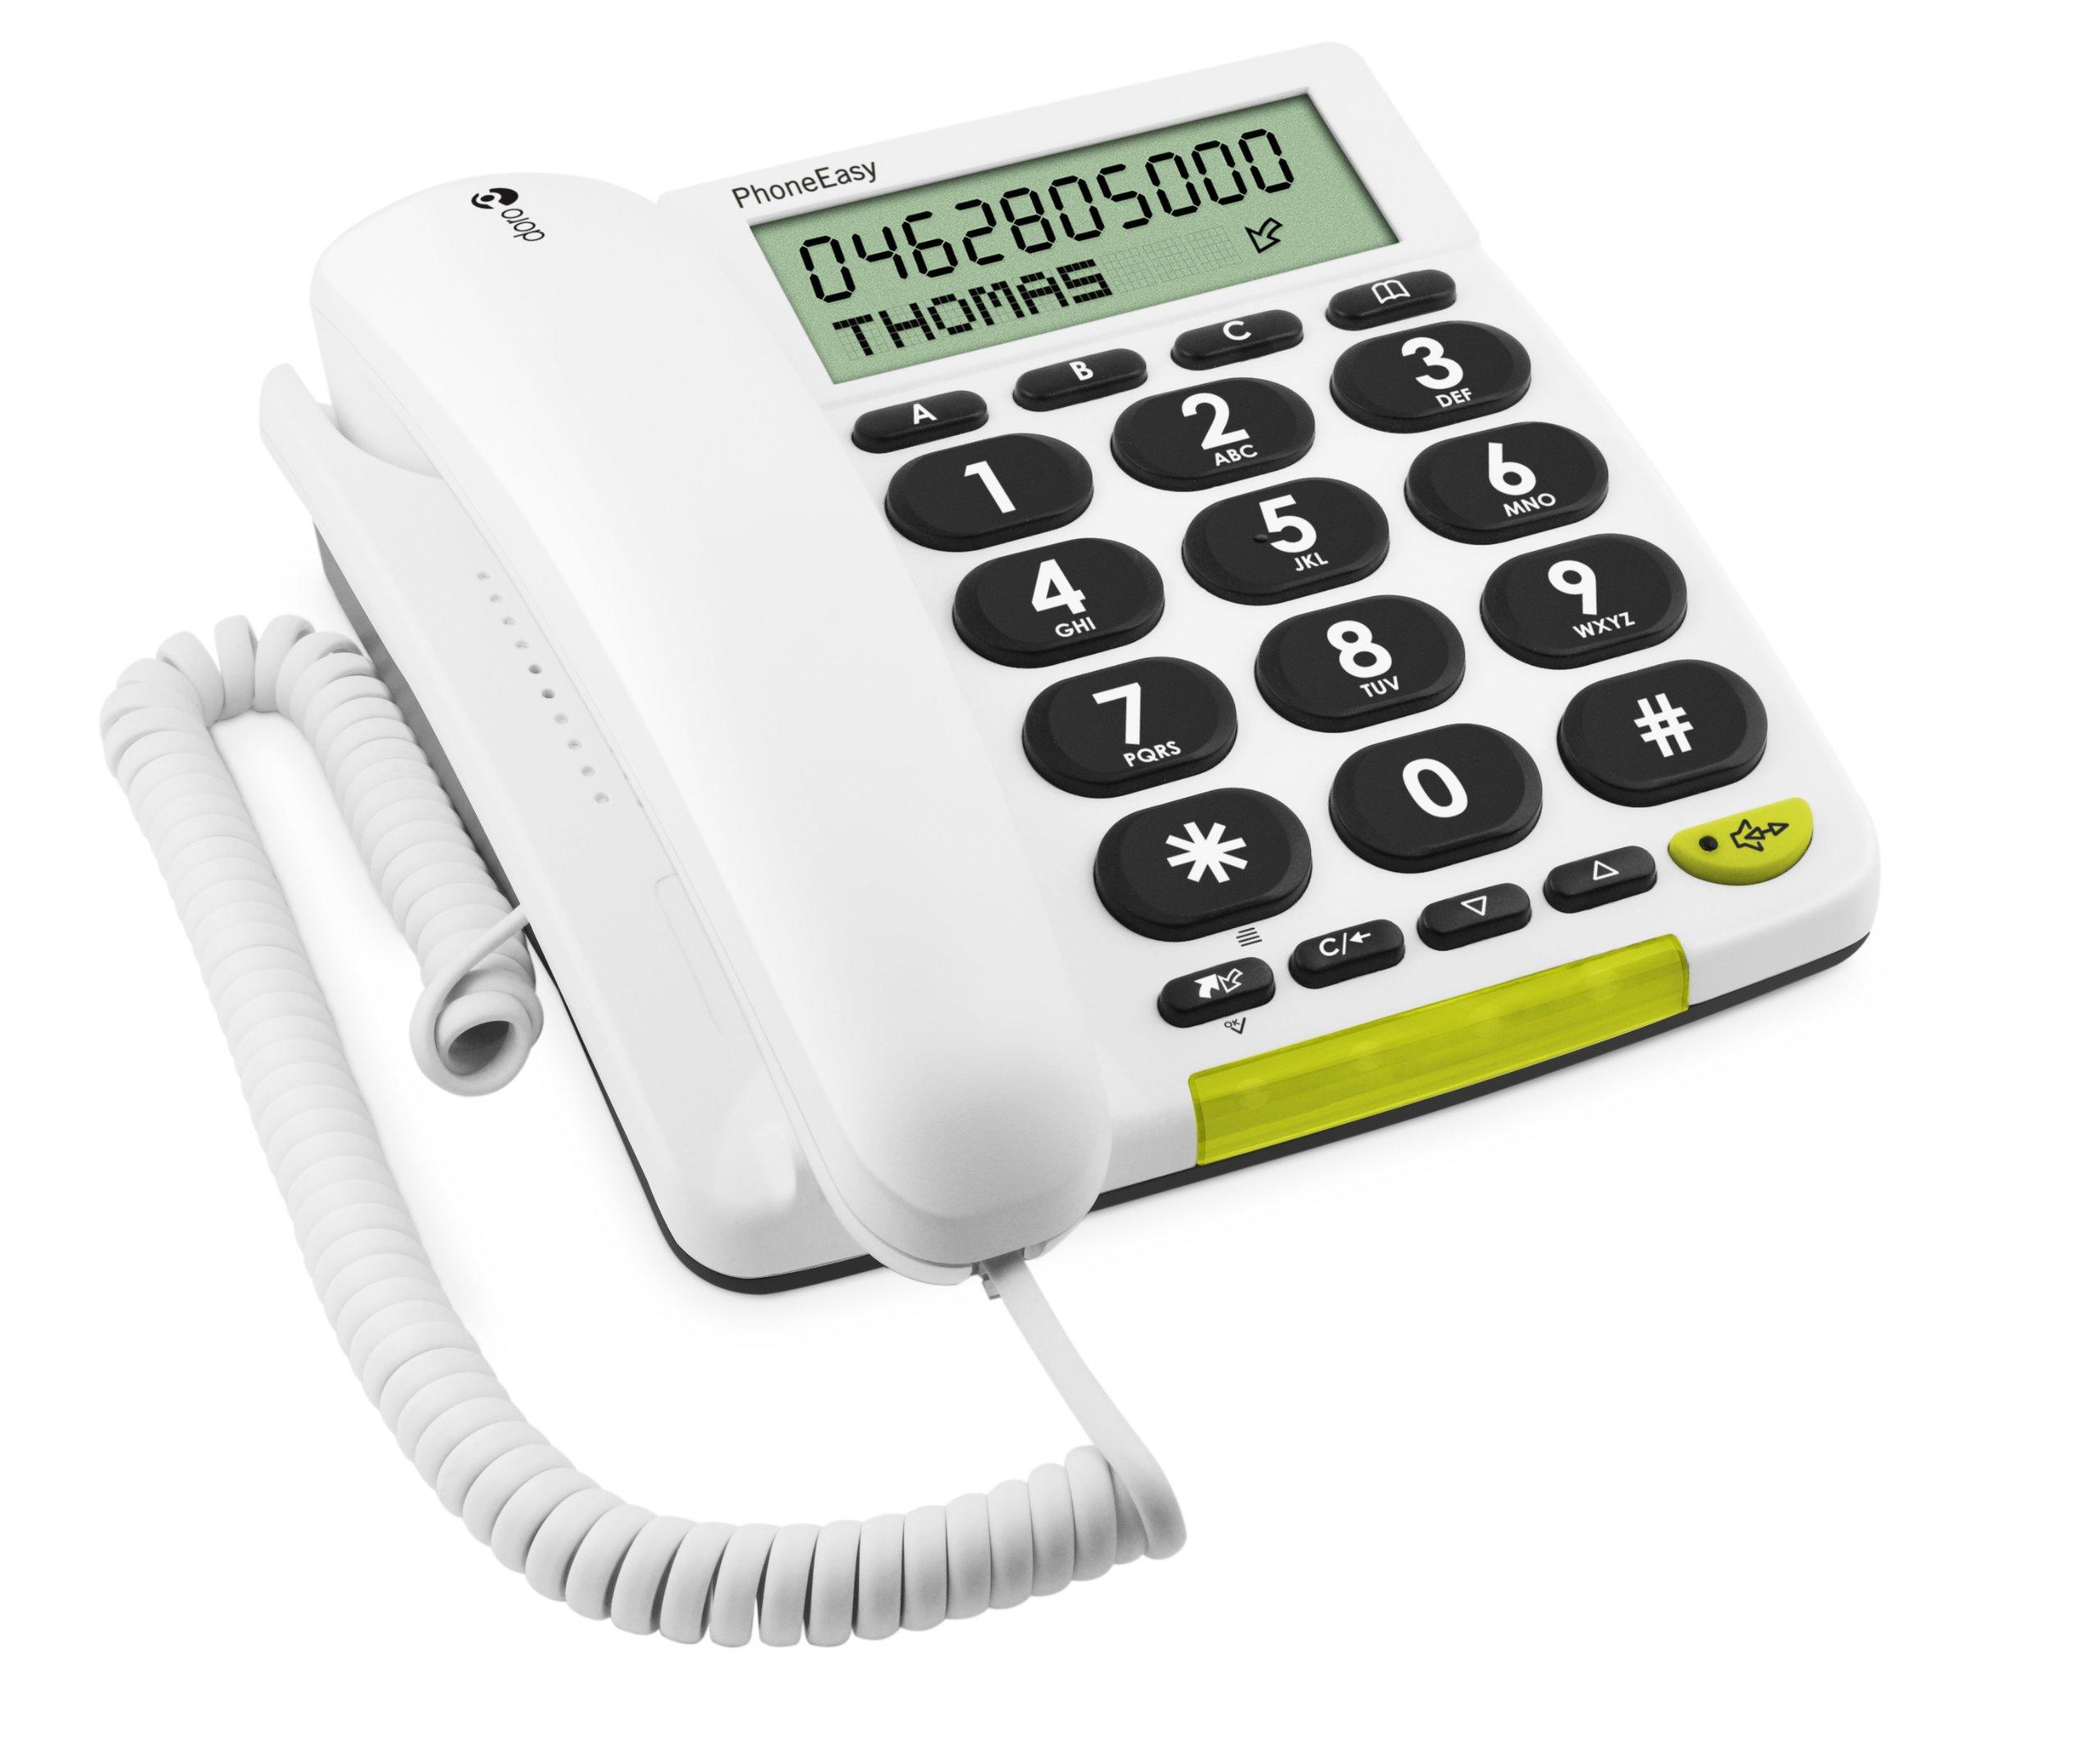 Telefonleitungen anhaken